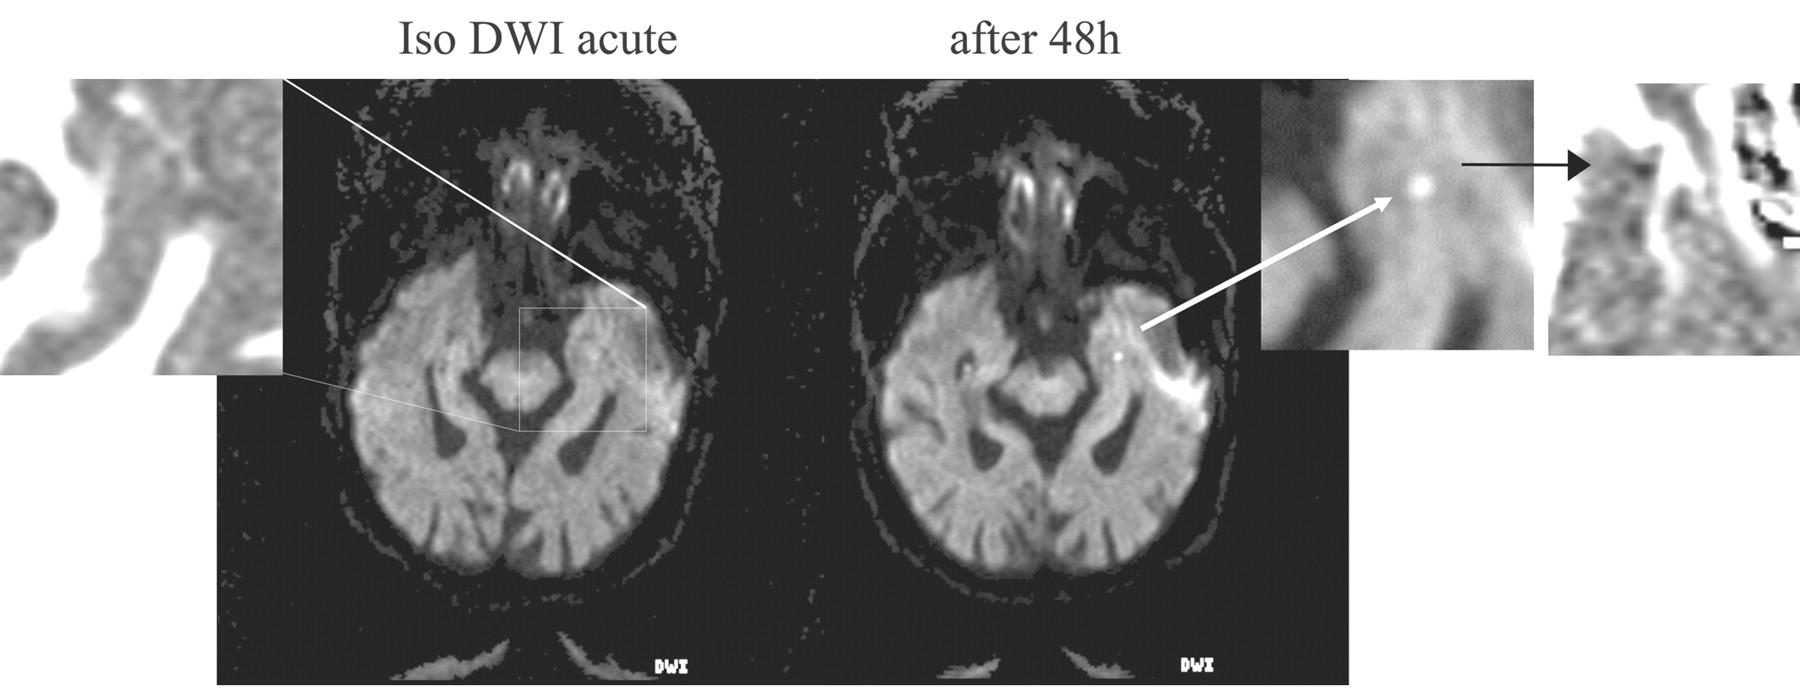 transient global amnesia emedicine